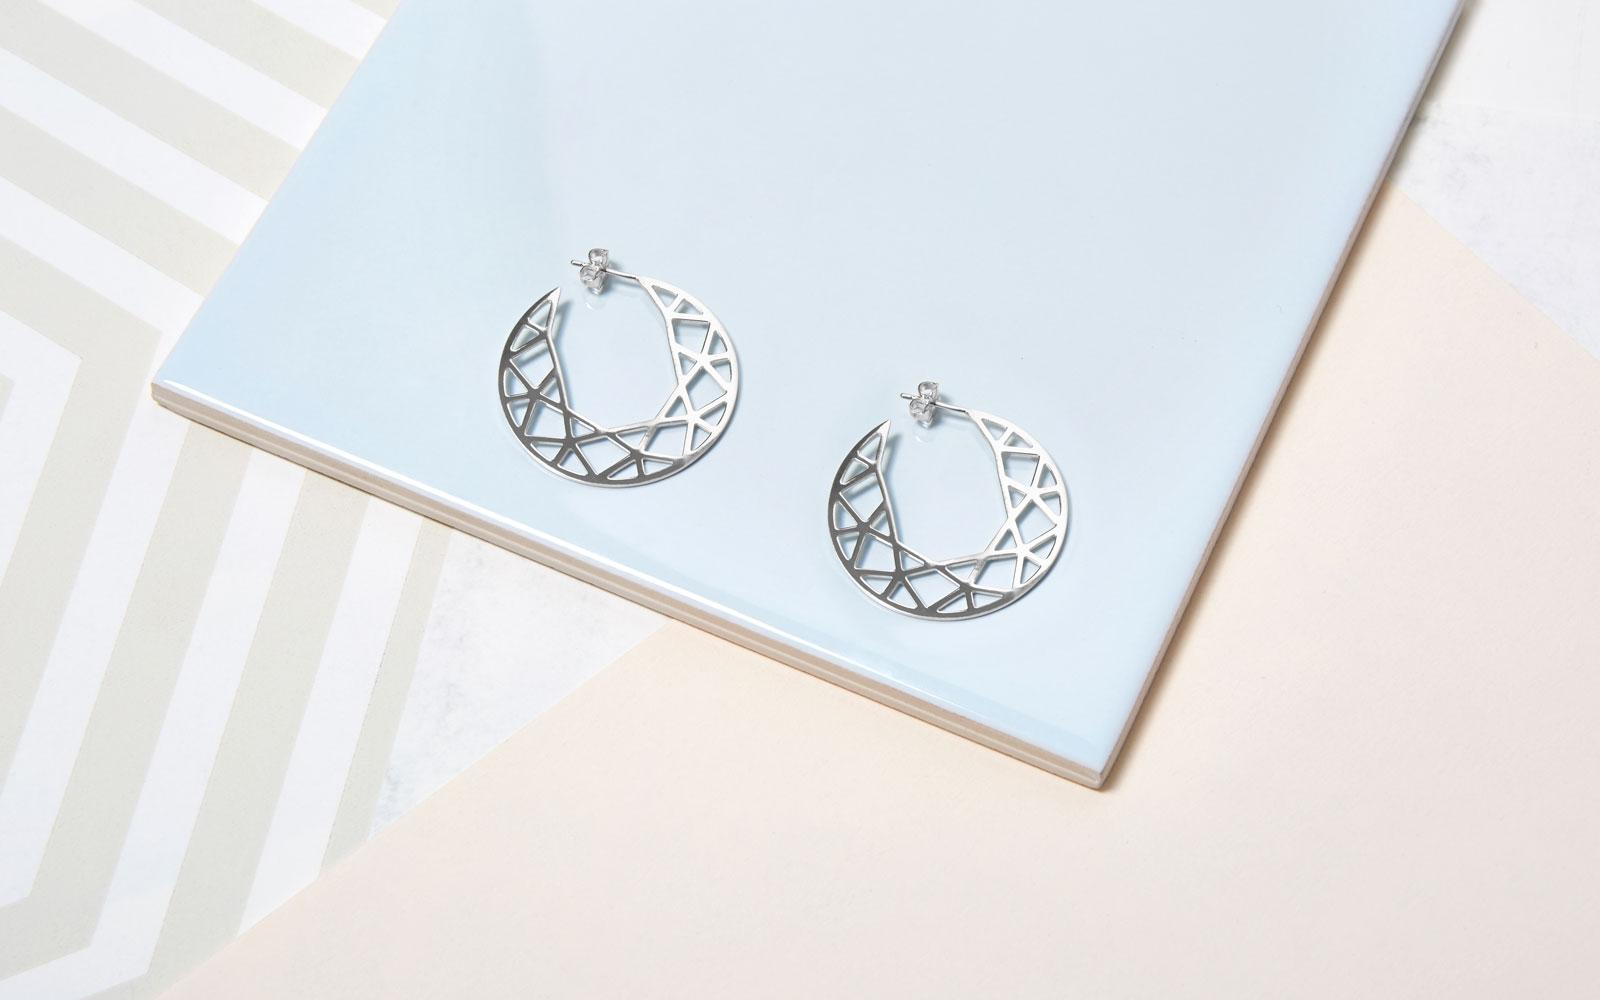 FI-myia-bonner-jewellery-06.jpg